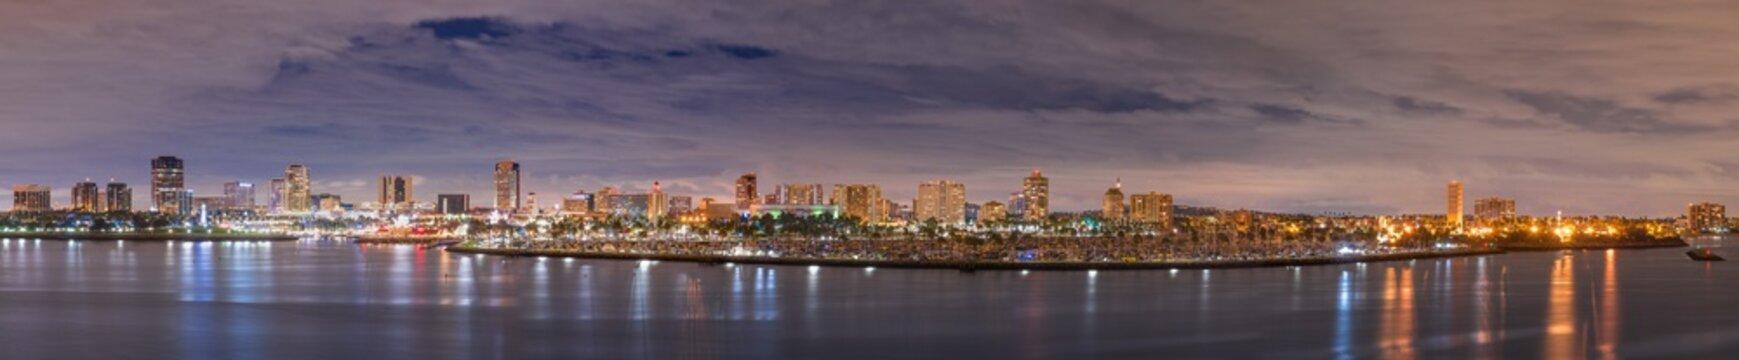 Long Beach California Panorama at night in cloudy night